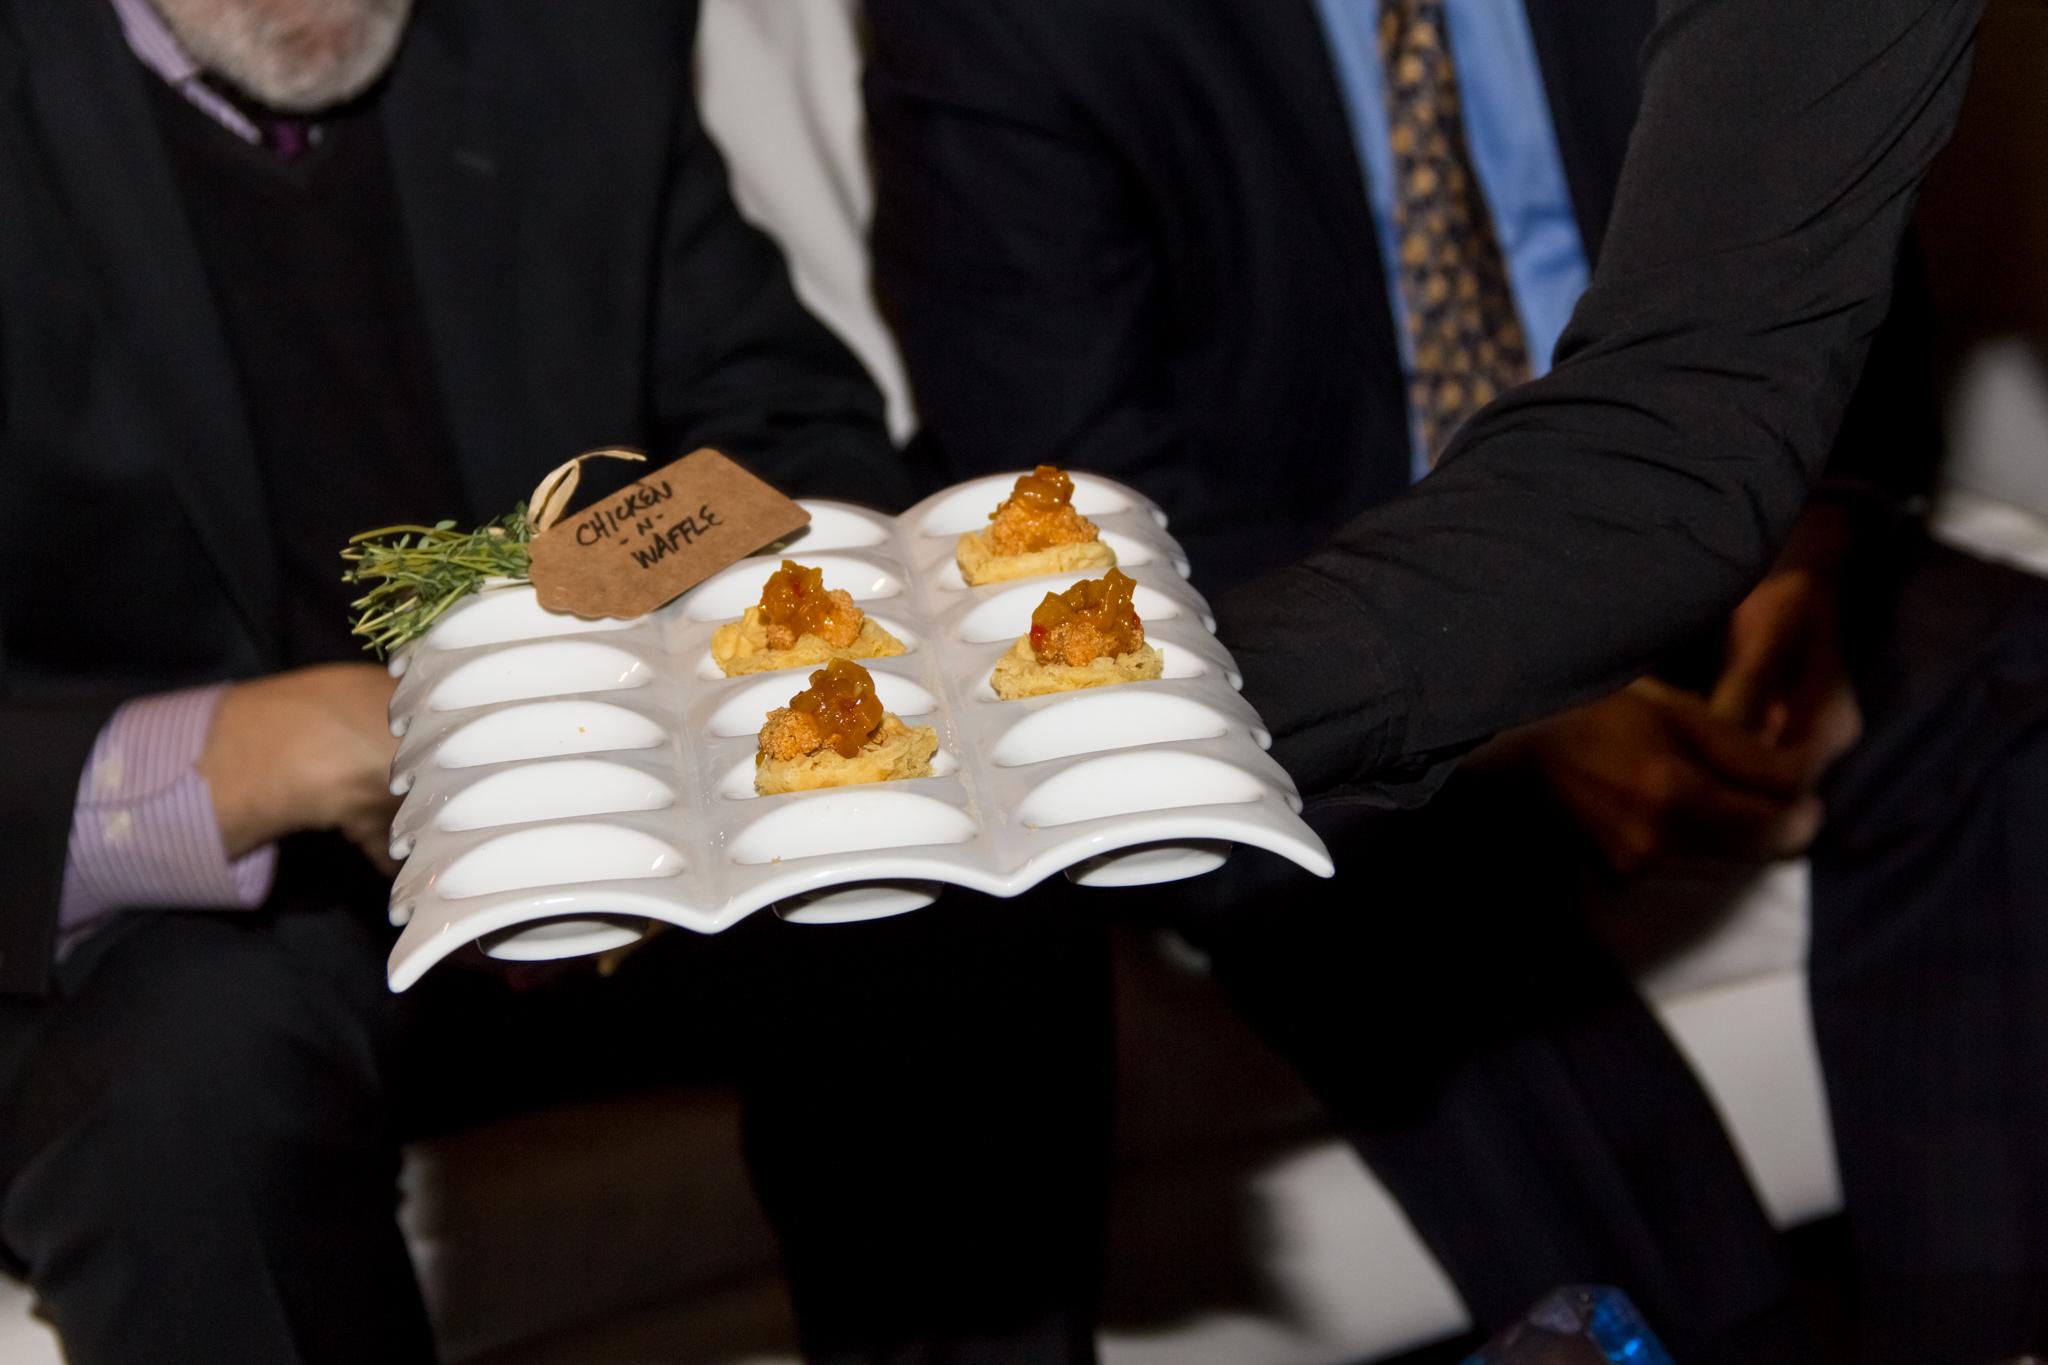 Chicken -n- Waffle